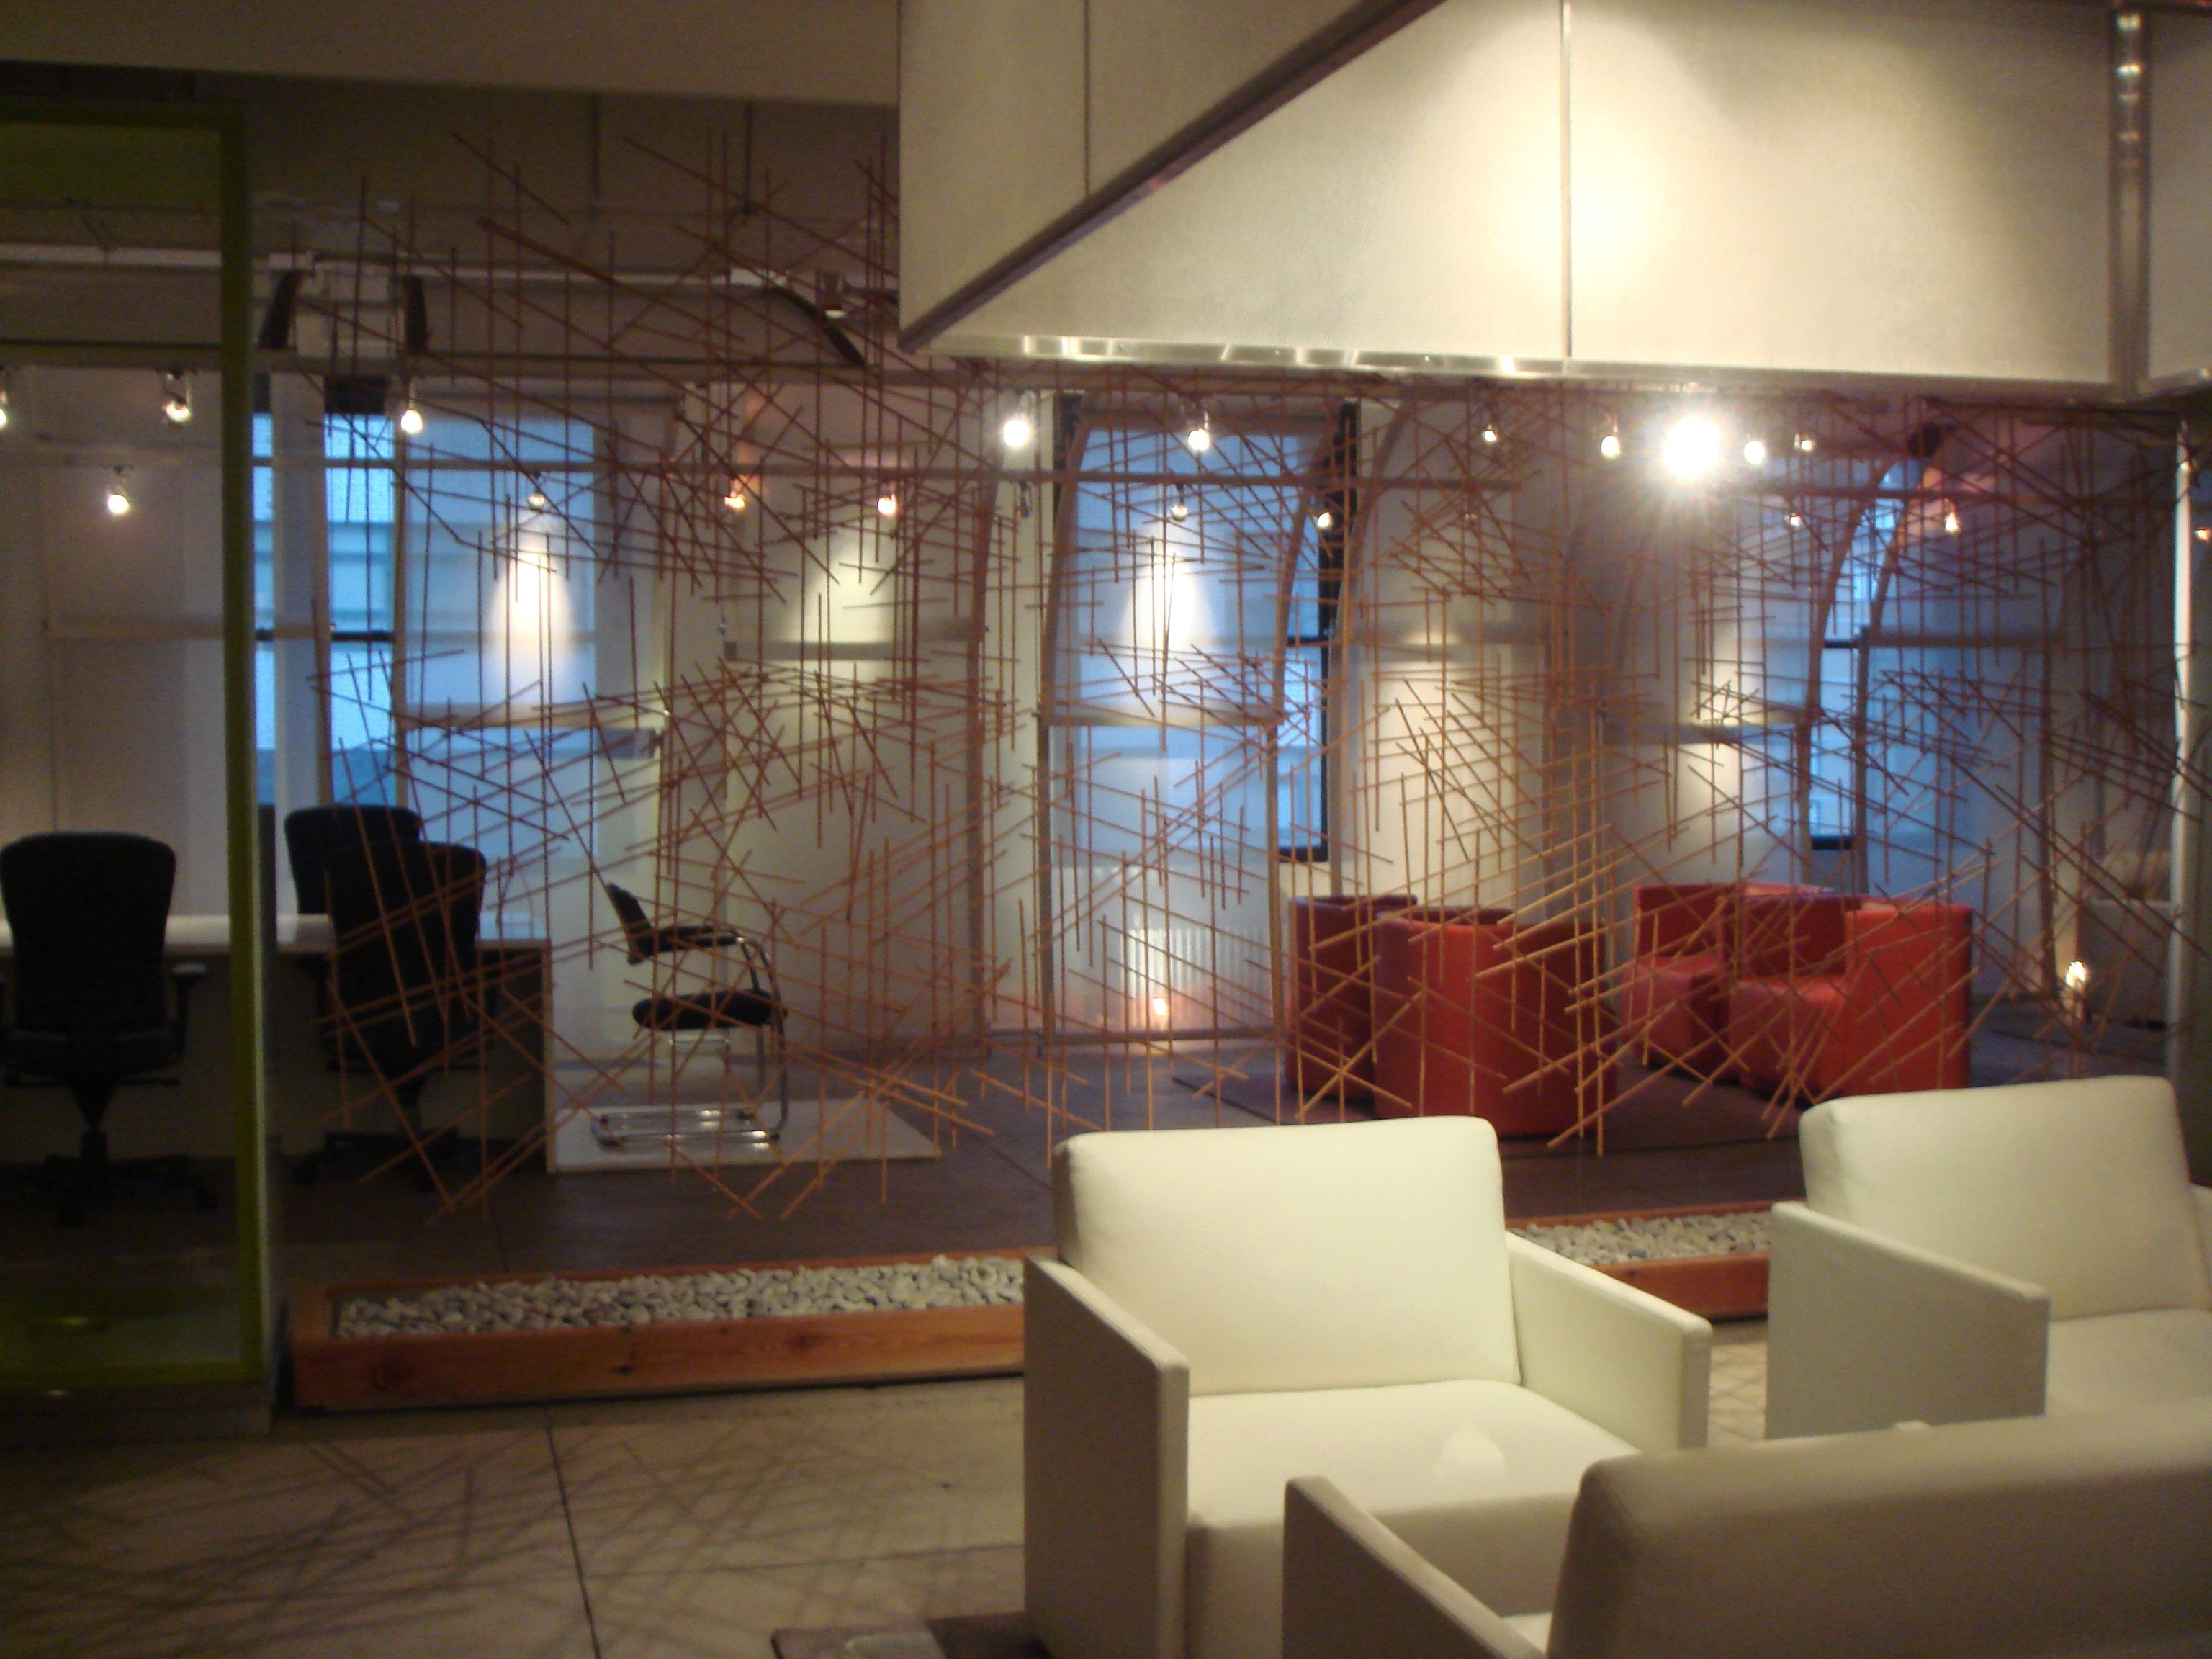 room divider mesh/wire screen | Room divider, California ...